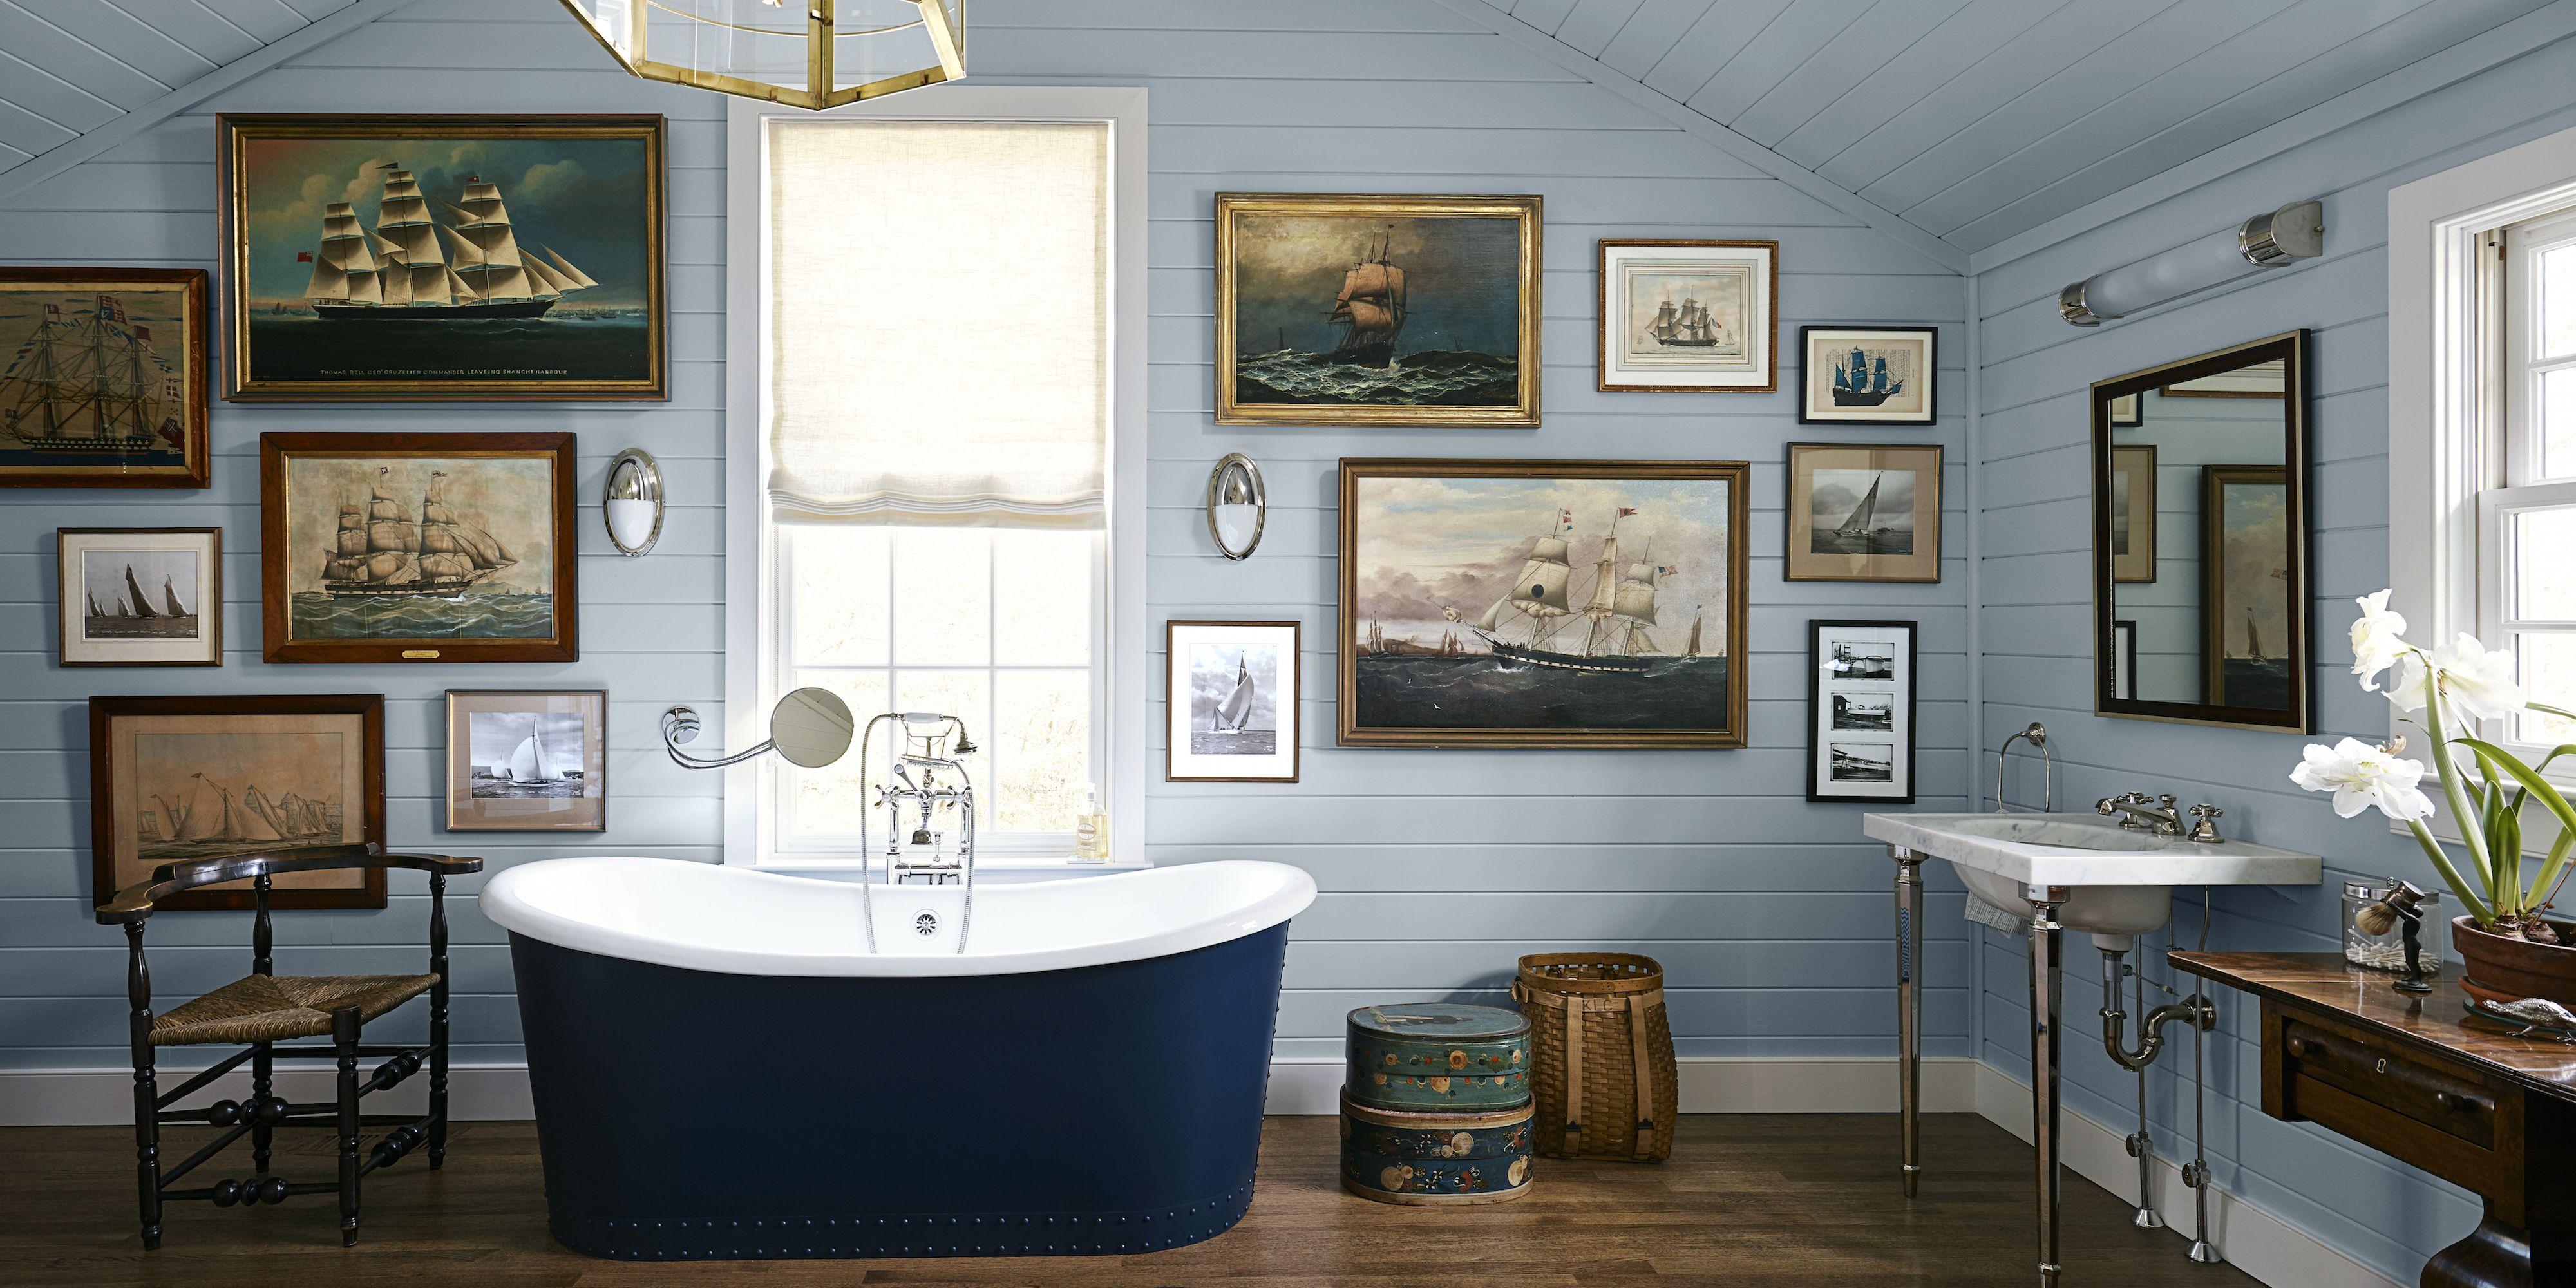 image. Bathrooms & 100+ Luxury Bathrooms - Photos of Best Bathroom Inspiration